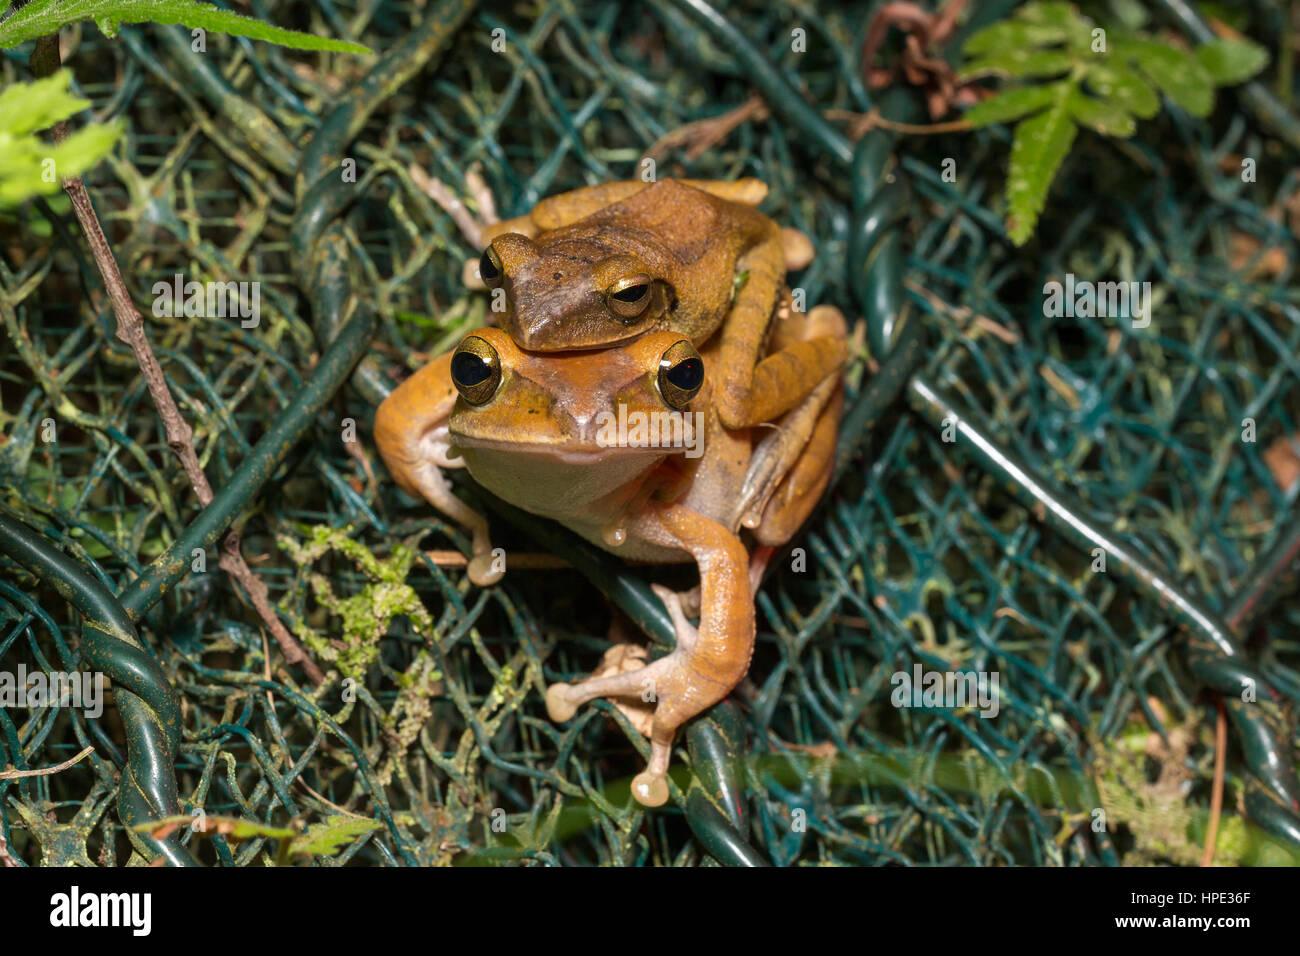 Spot-legged Tree Frog mating - Stock Image